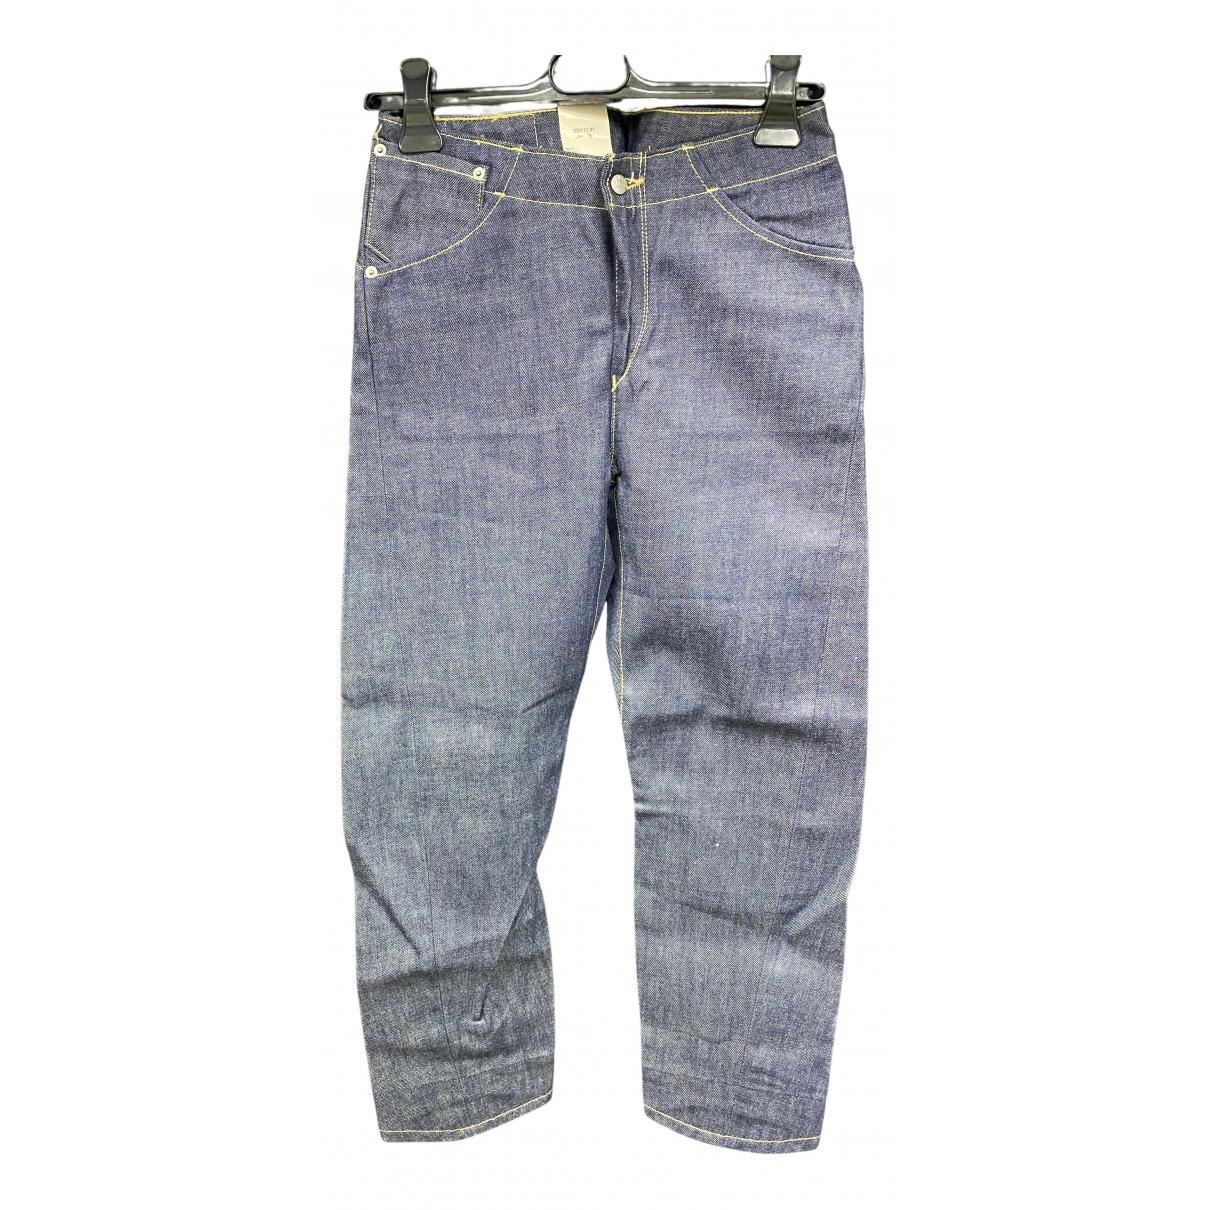 Levi's Vintage Clothing N Denim - Jeans Jeans for Women 27 US